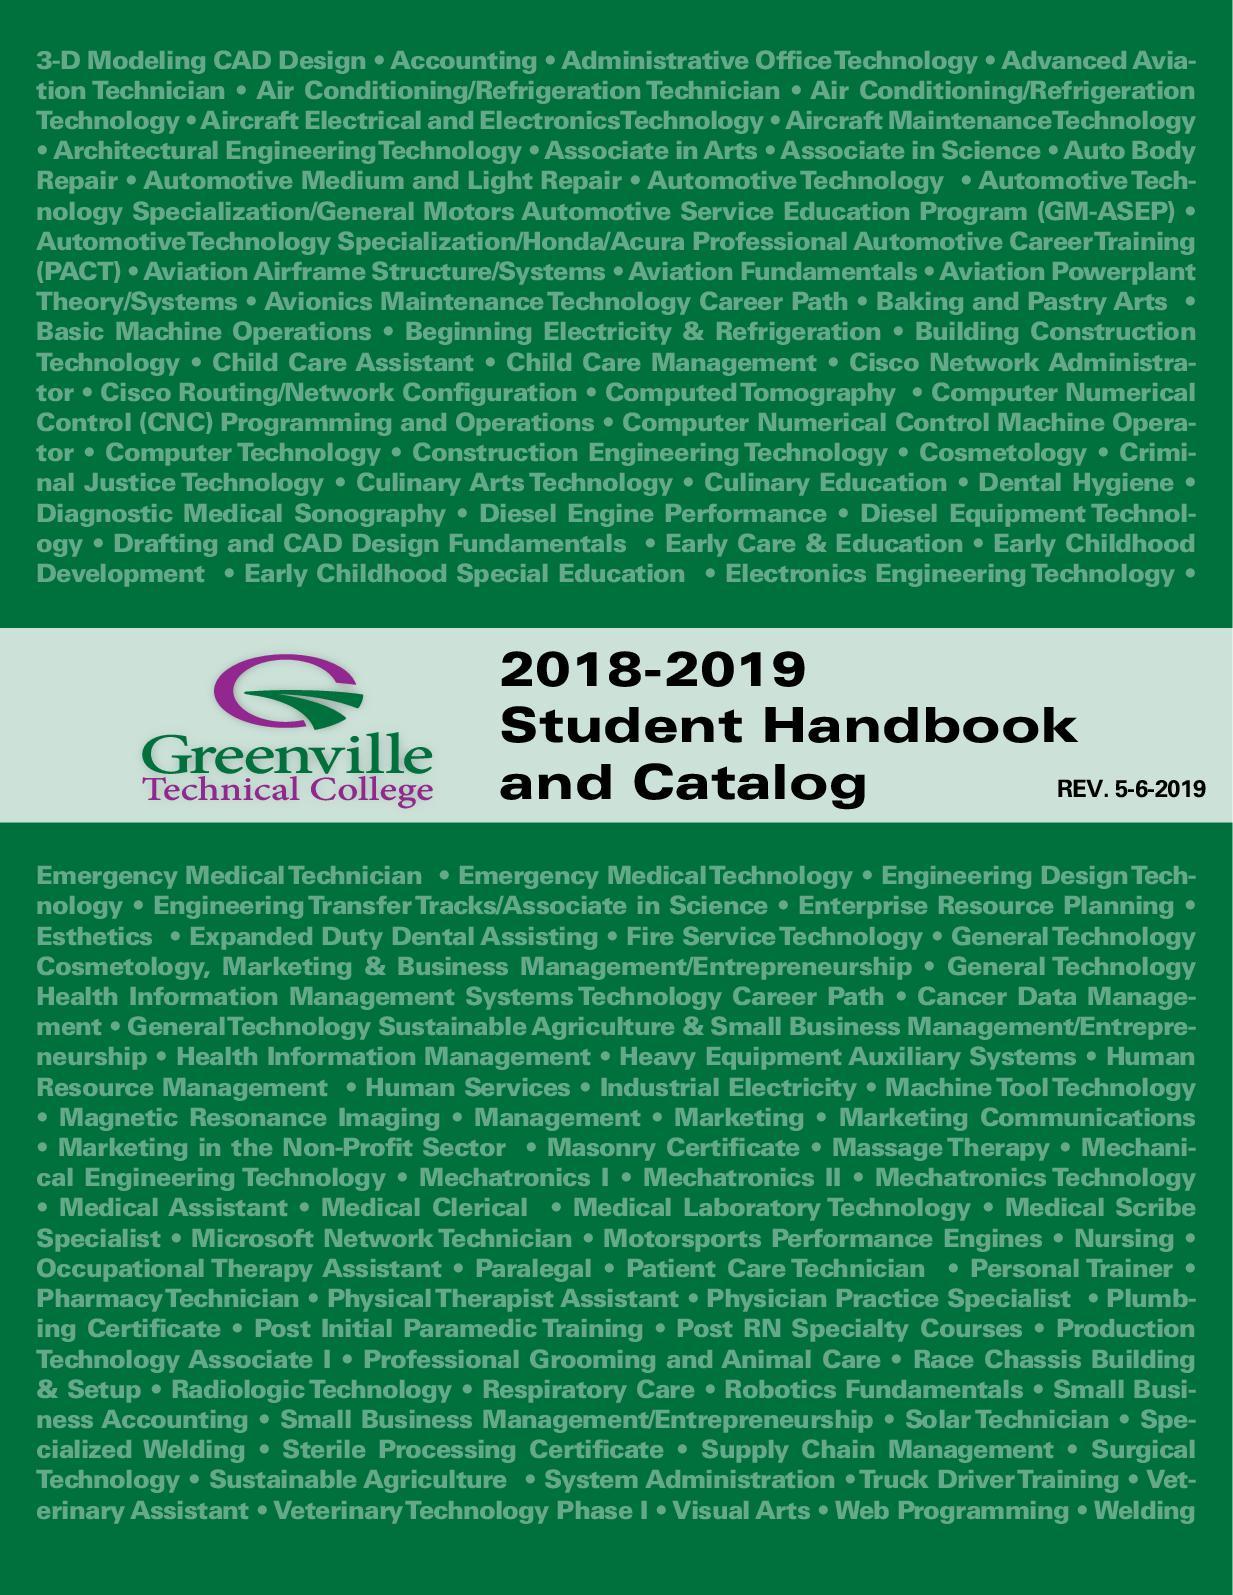 hight resolution of 2018 catalog and student handbook